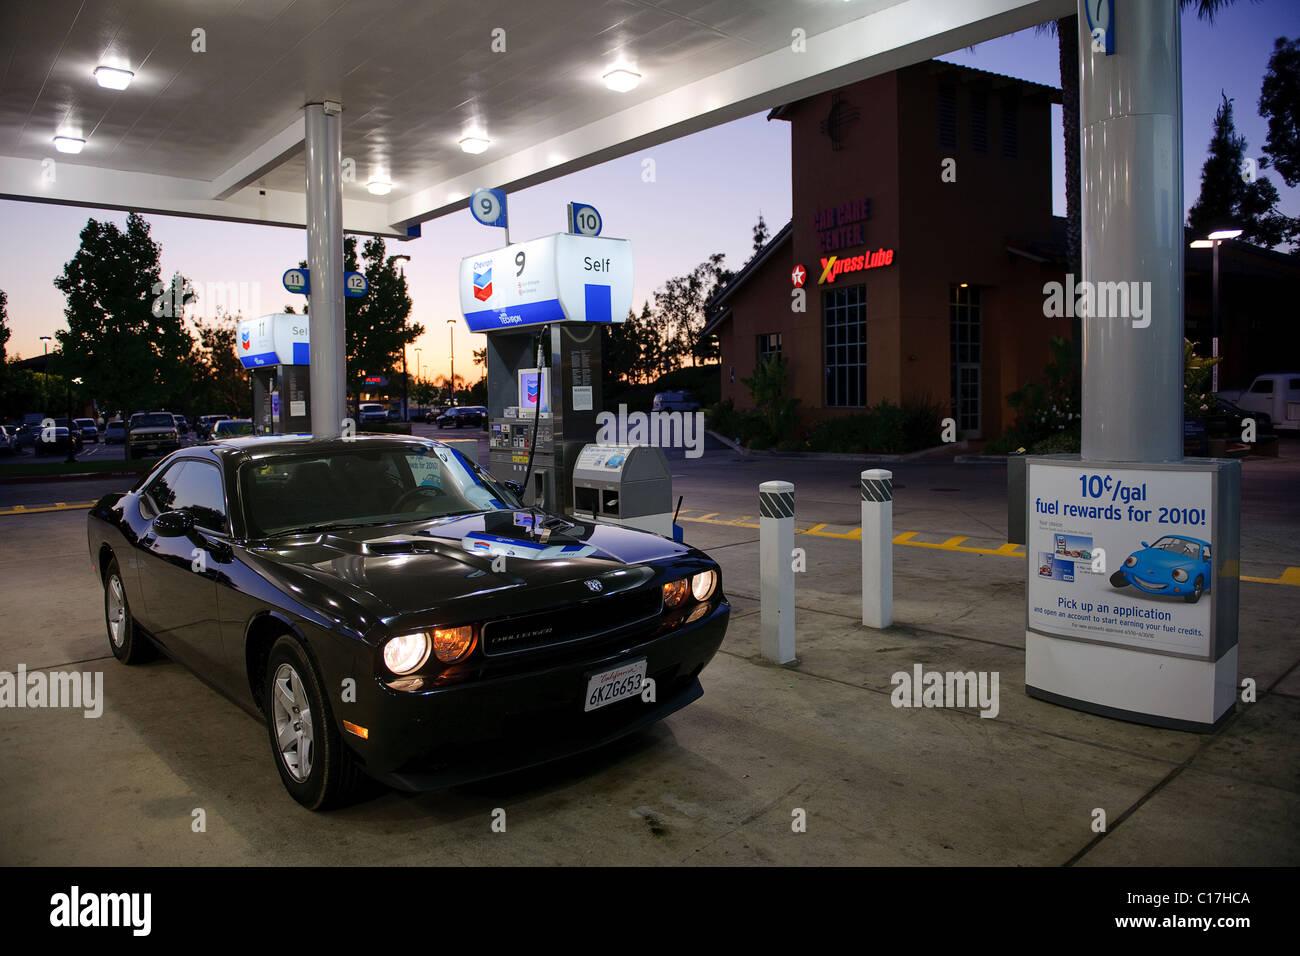 Dodge Challenger muscle car twilight moody retro muscle car USA Lake Elsinore supercar midlife crisis garage petrol - Stock Image